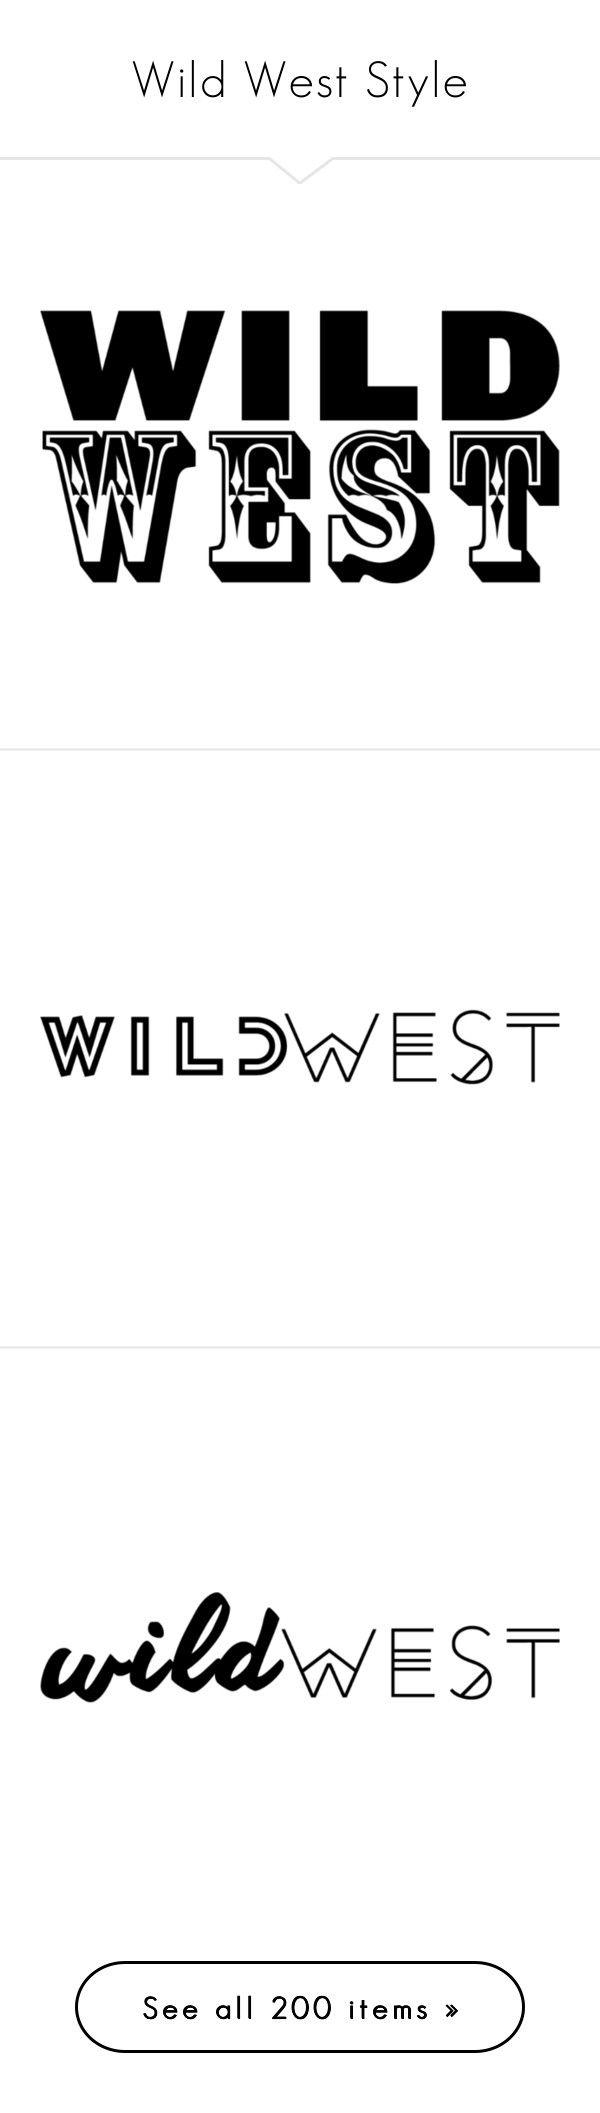 80 best wild west images on pinterest western theme cowboy